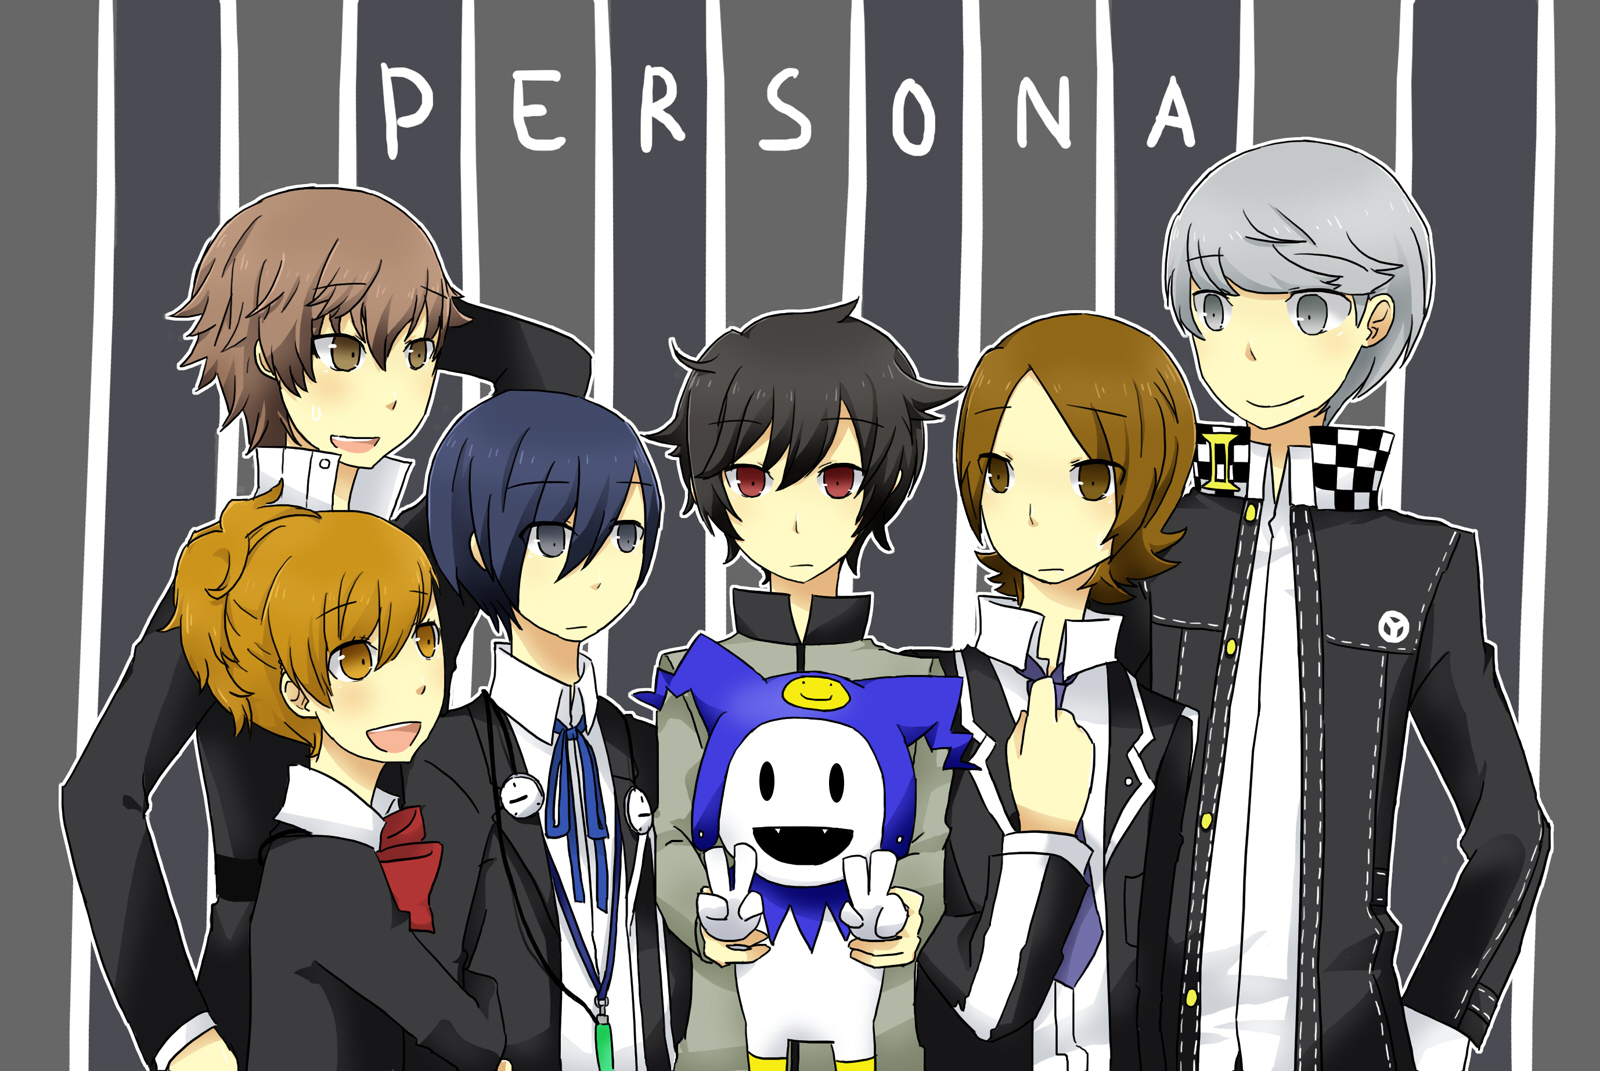 Persona 4 Anime Characters : Persona series image  zerochan anime board